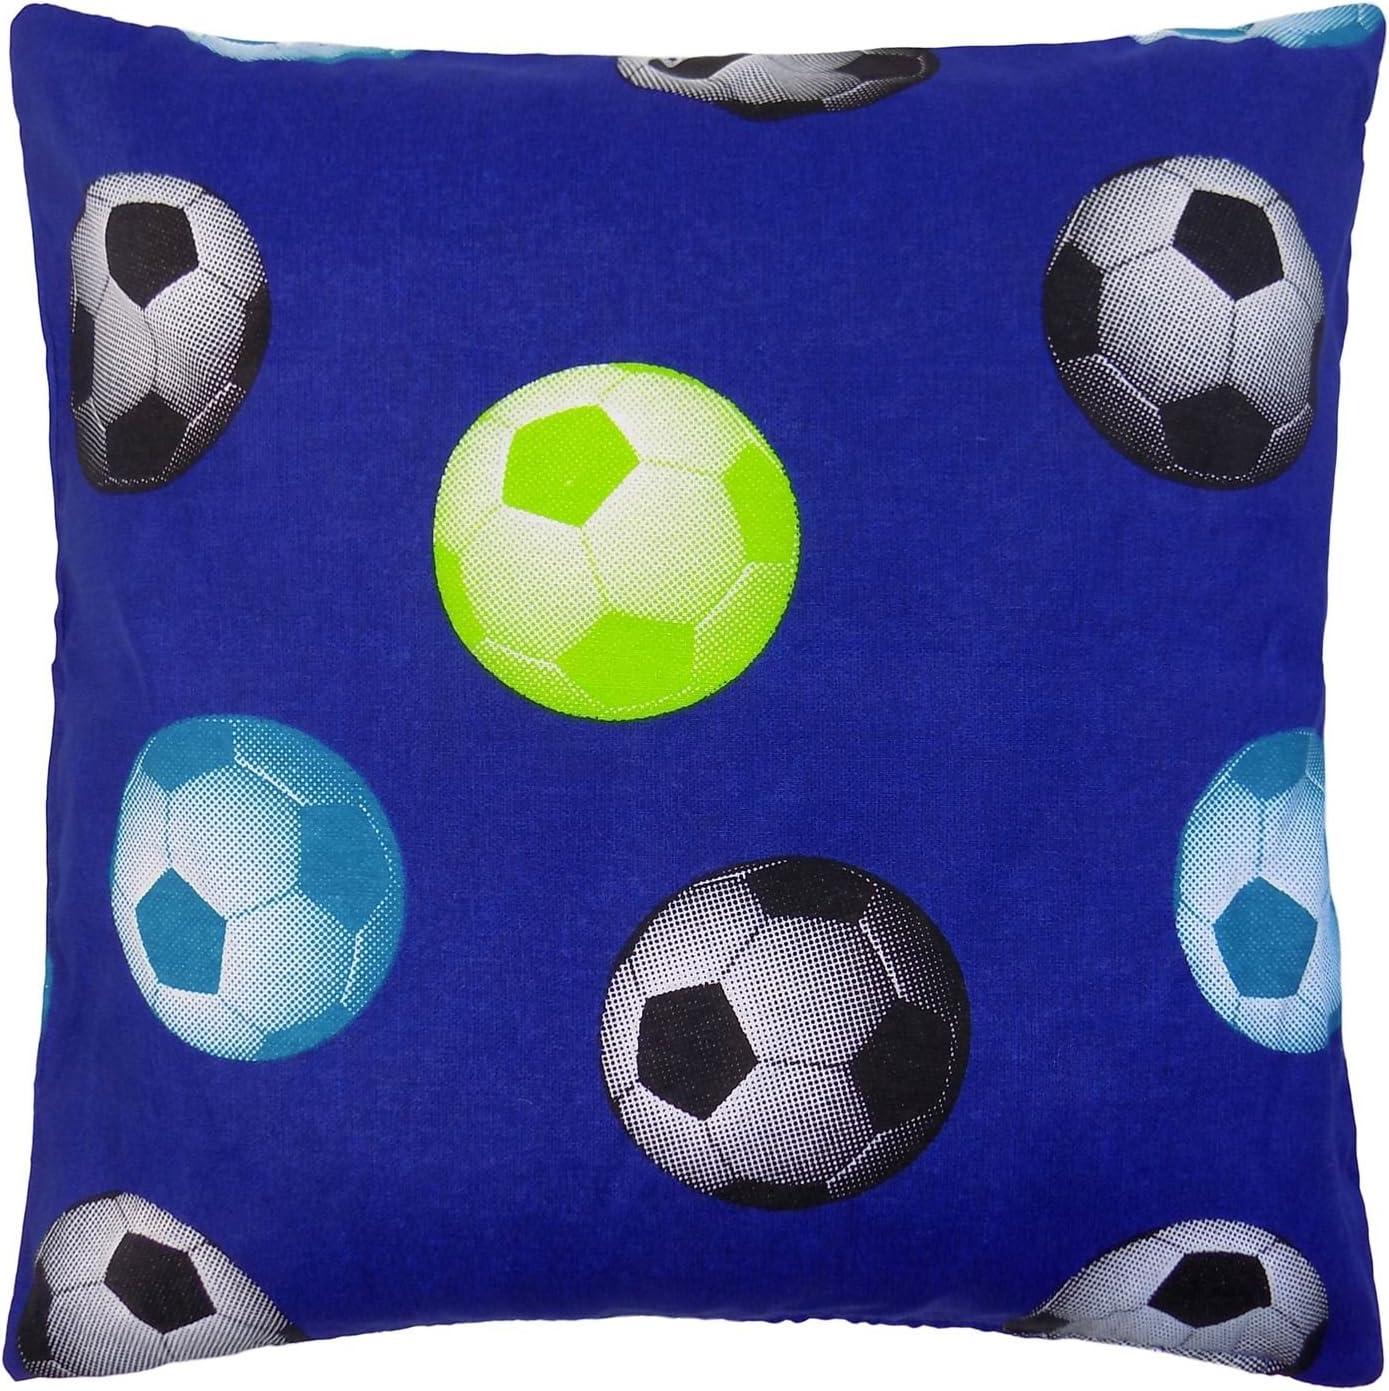 "45CM CUSHION COVER FOOTBALL BLUE BLACK GREEN COTTON BLEND HANDMADE IN UK 18/"""